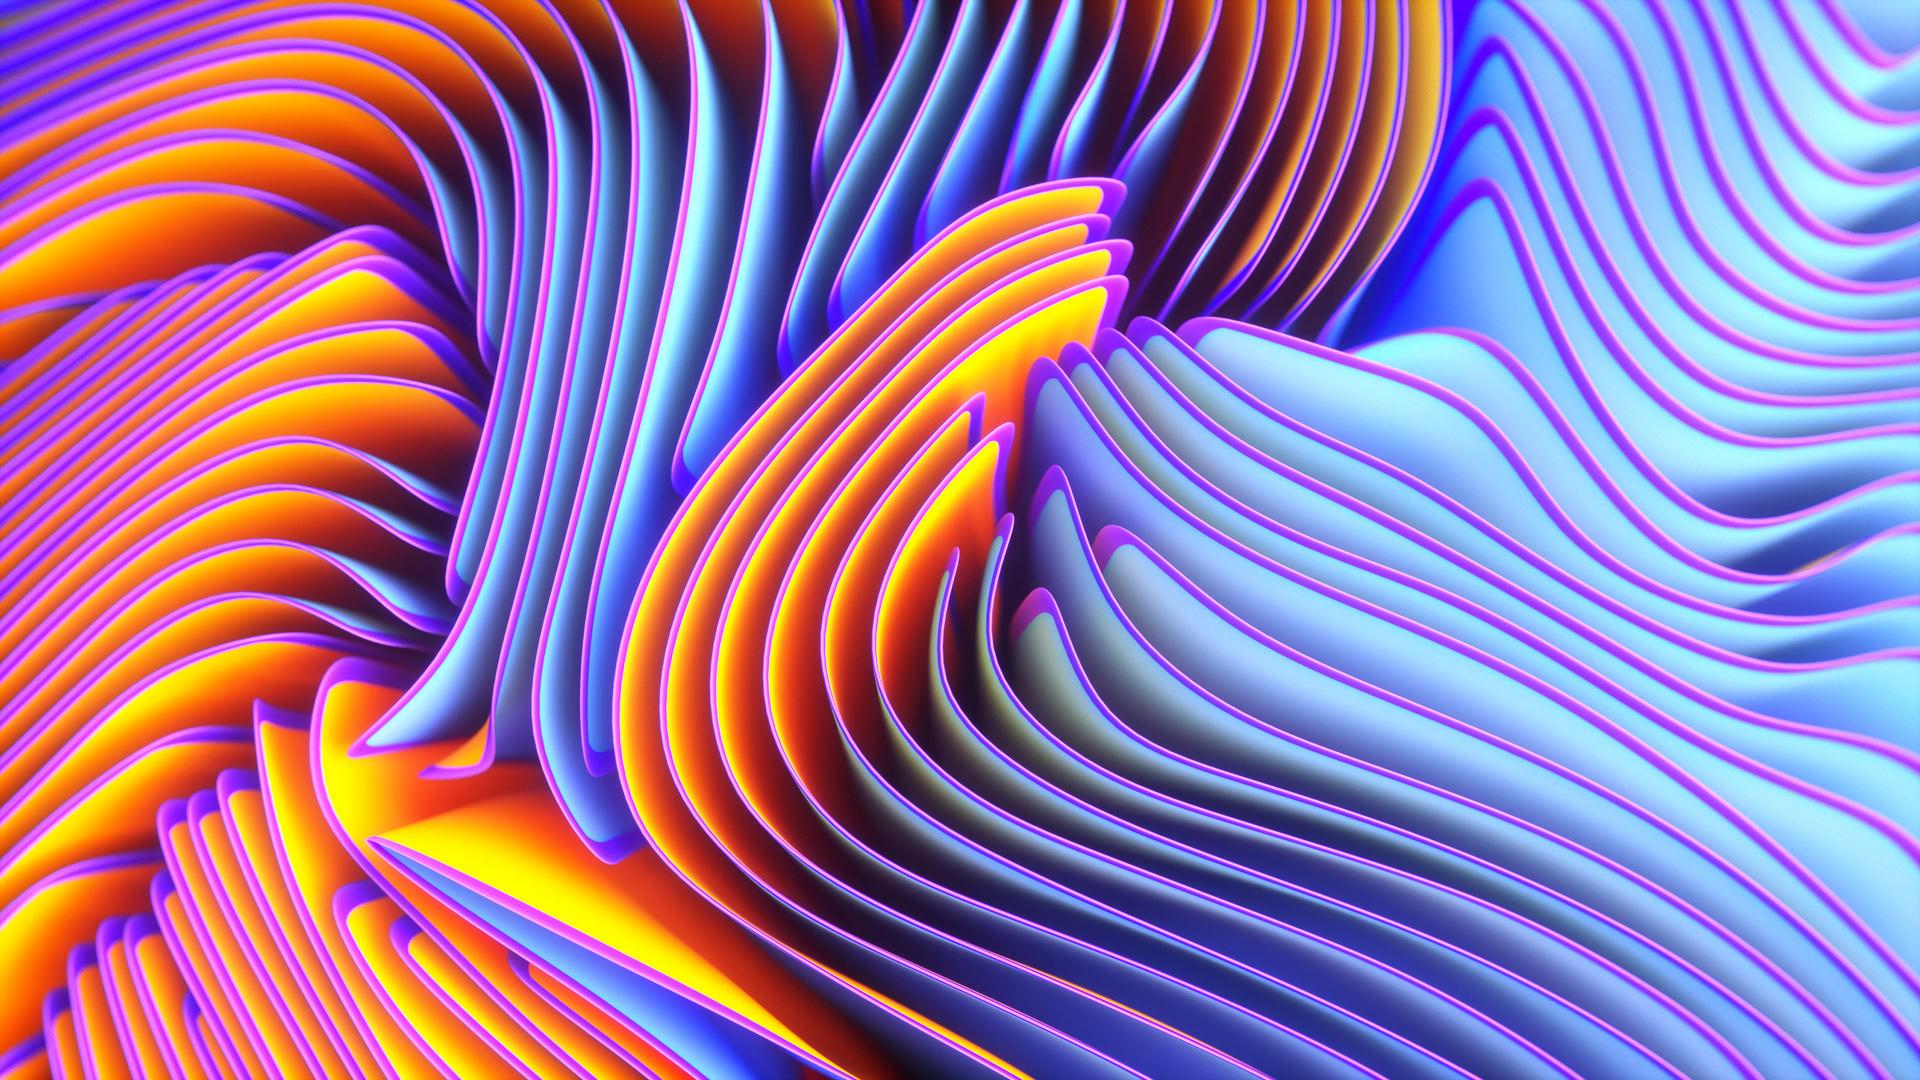 Twirl_02_02-1